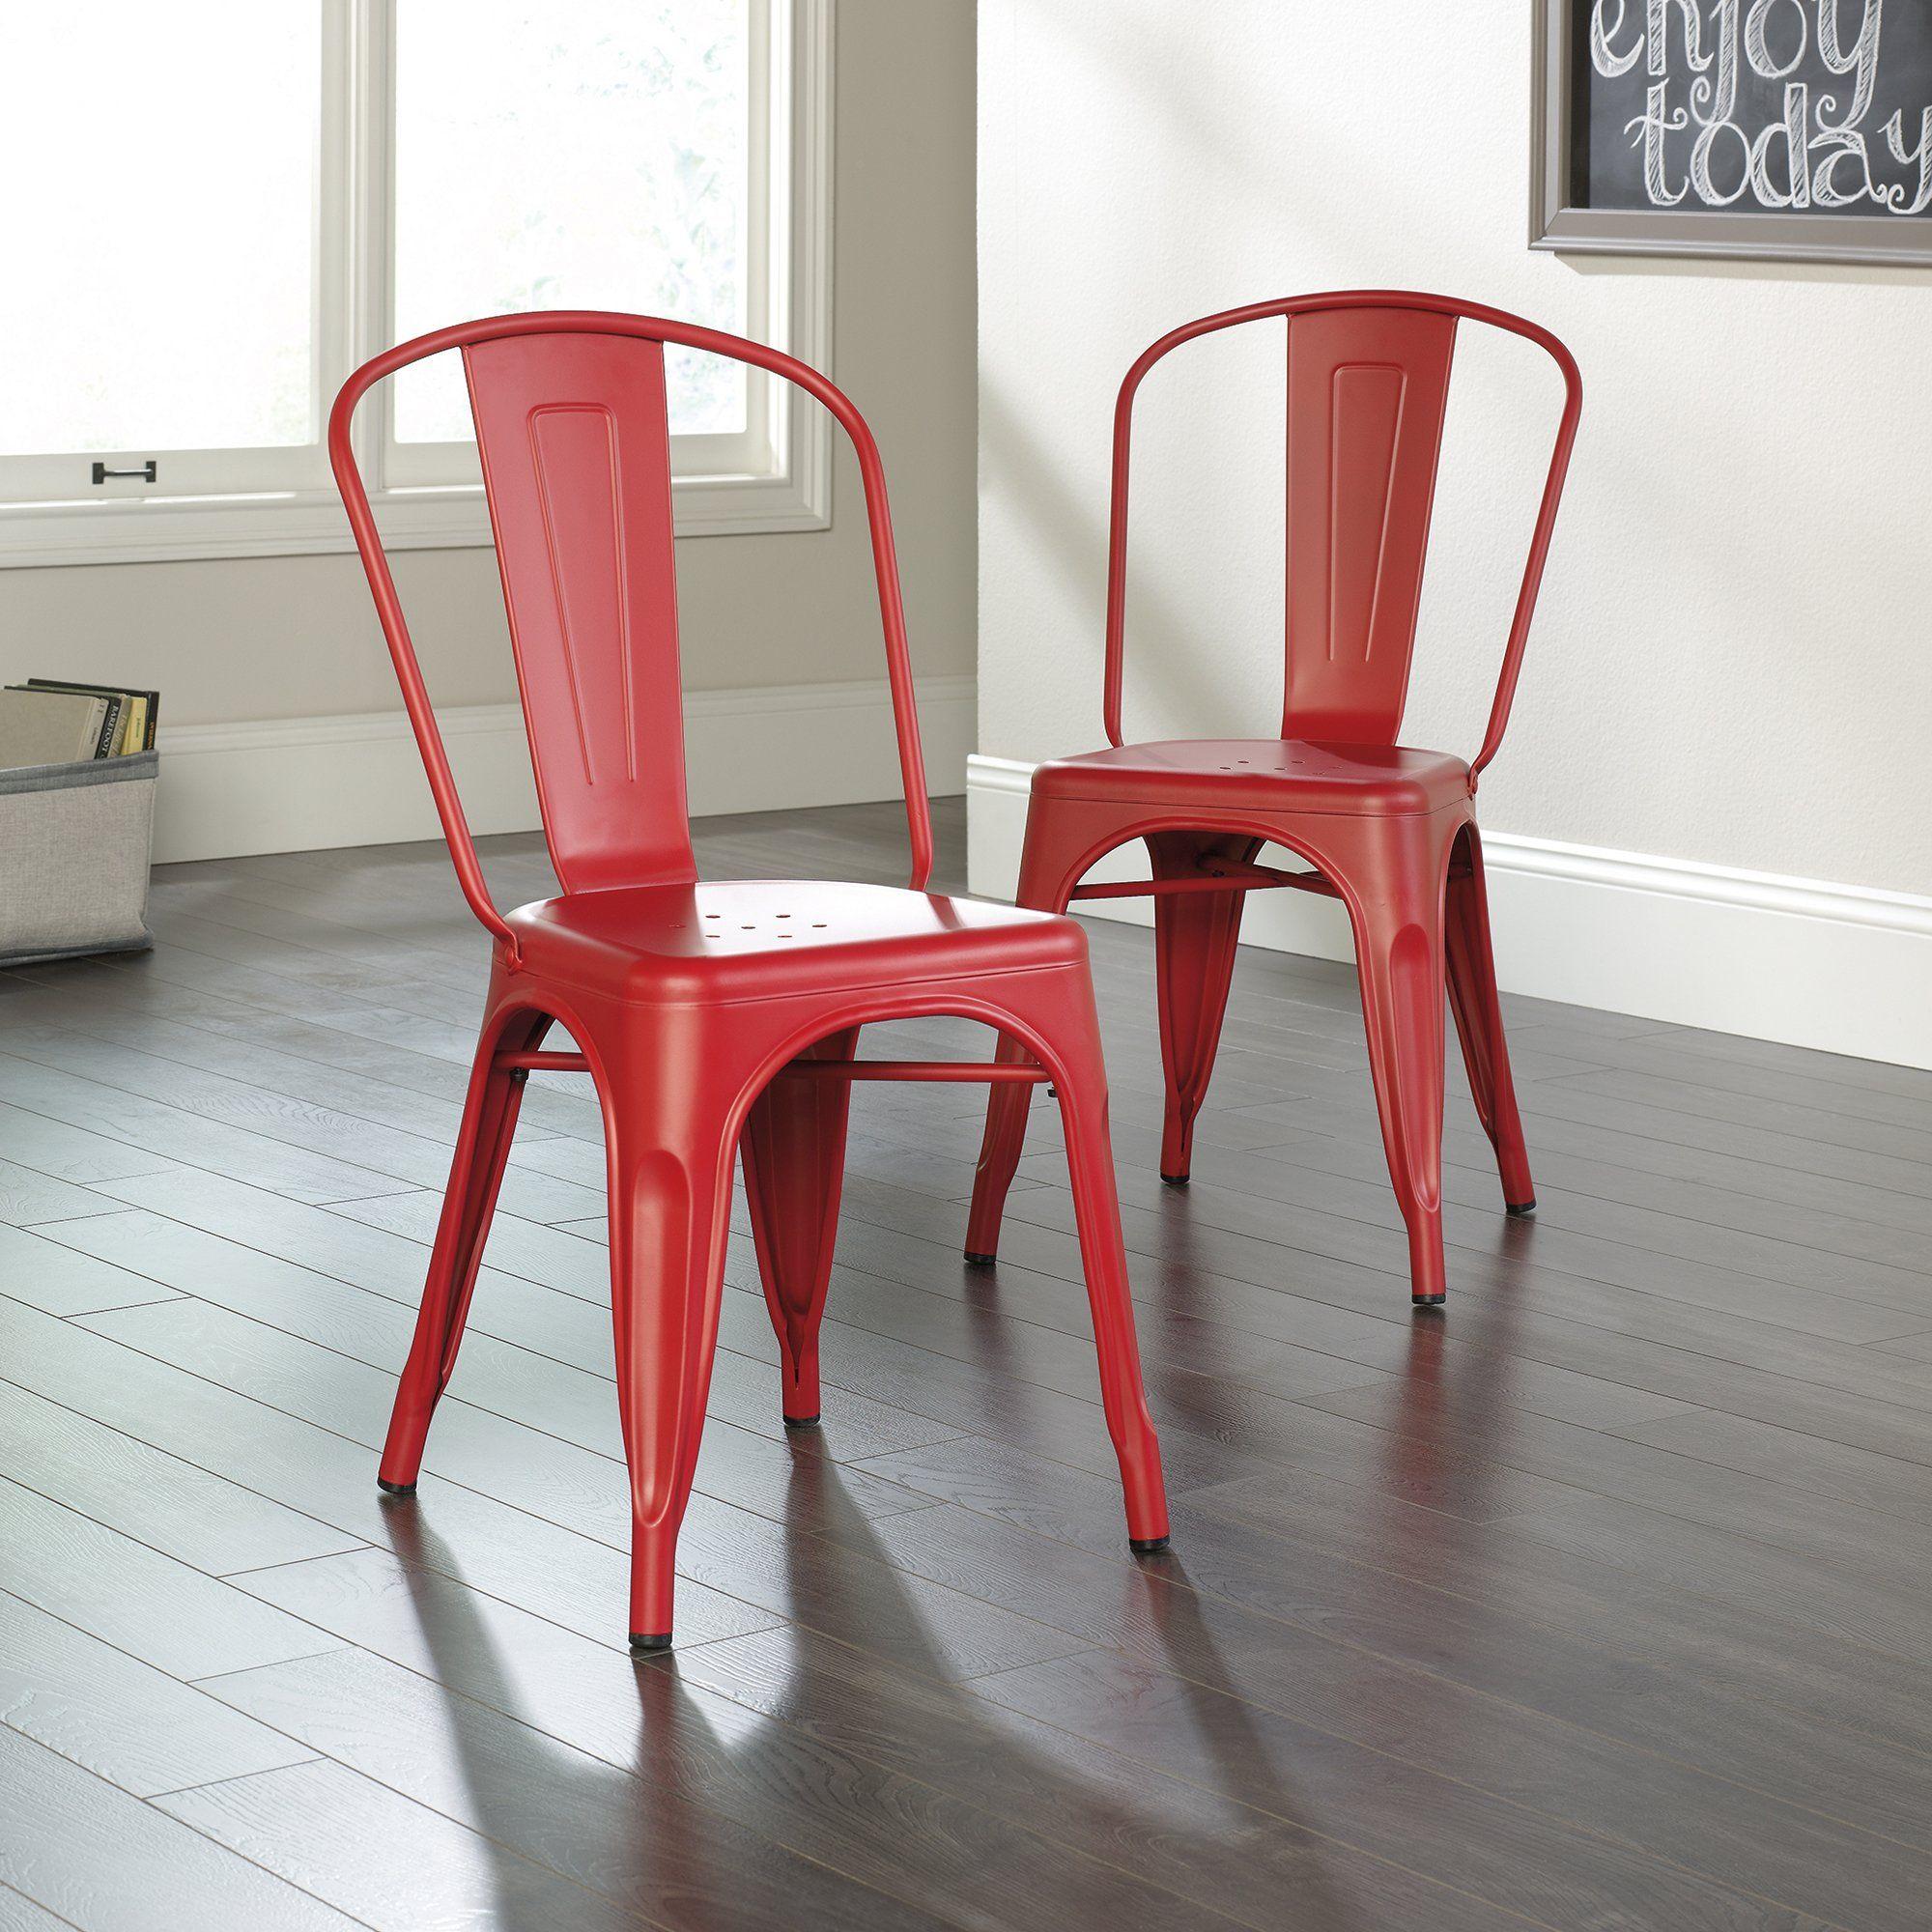 Sauder 419741 New Grange Collection Matte Red Caf Chair Set Of 2